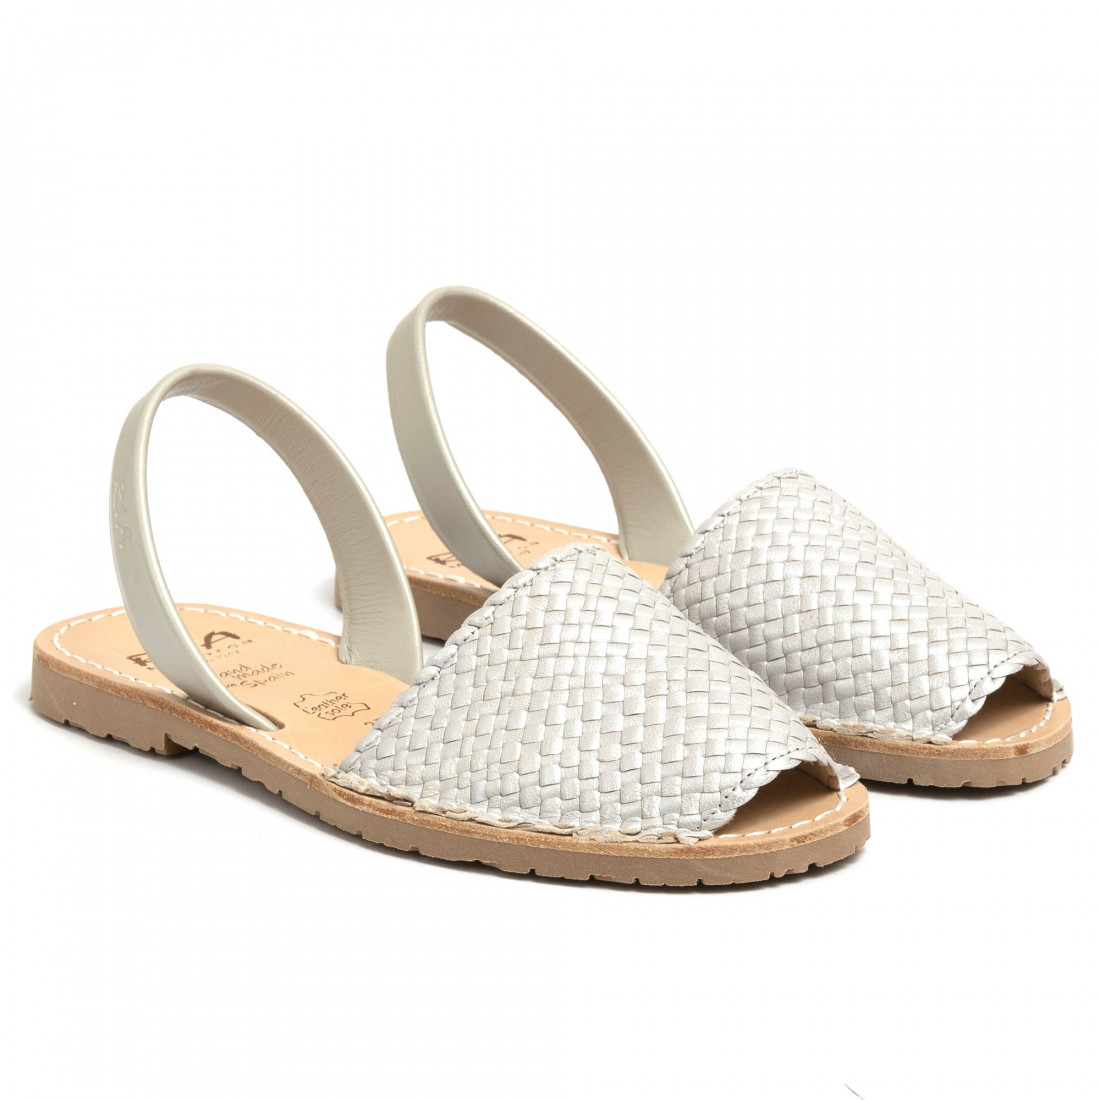 sandals woman ria menorca 21397ice 7144